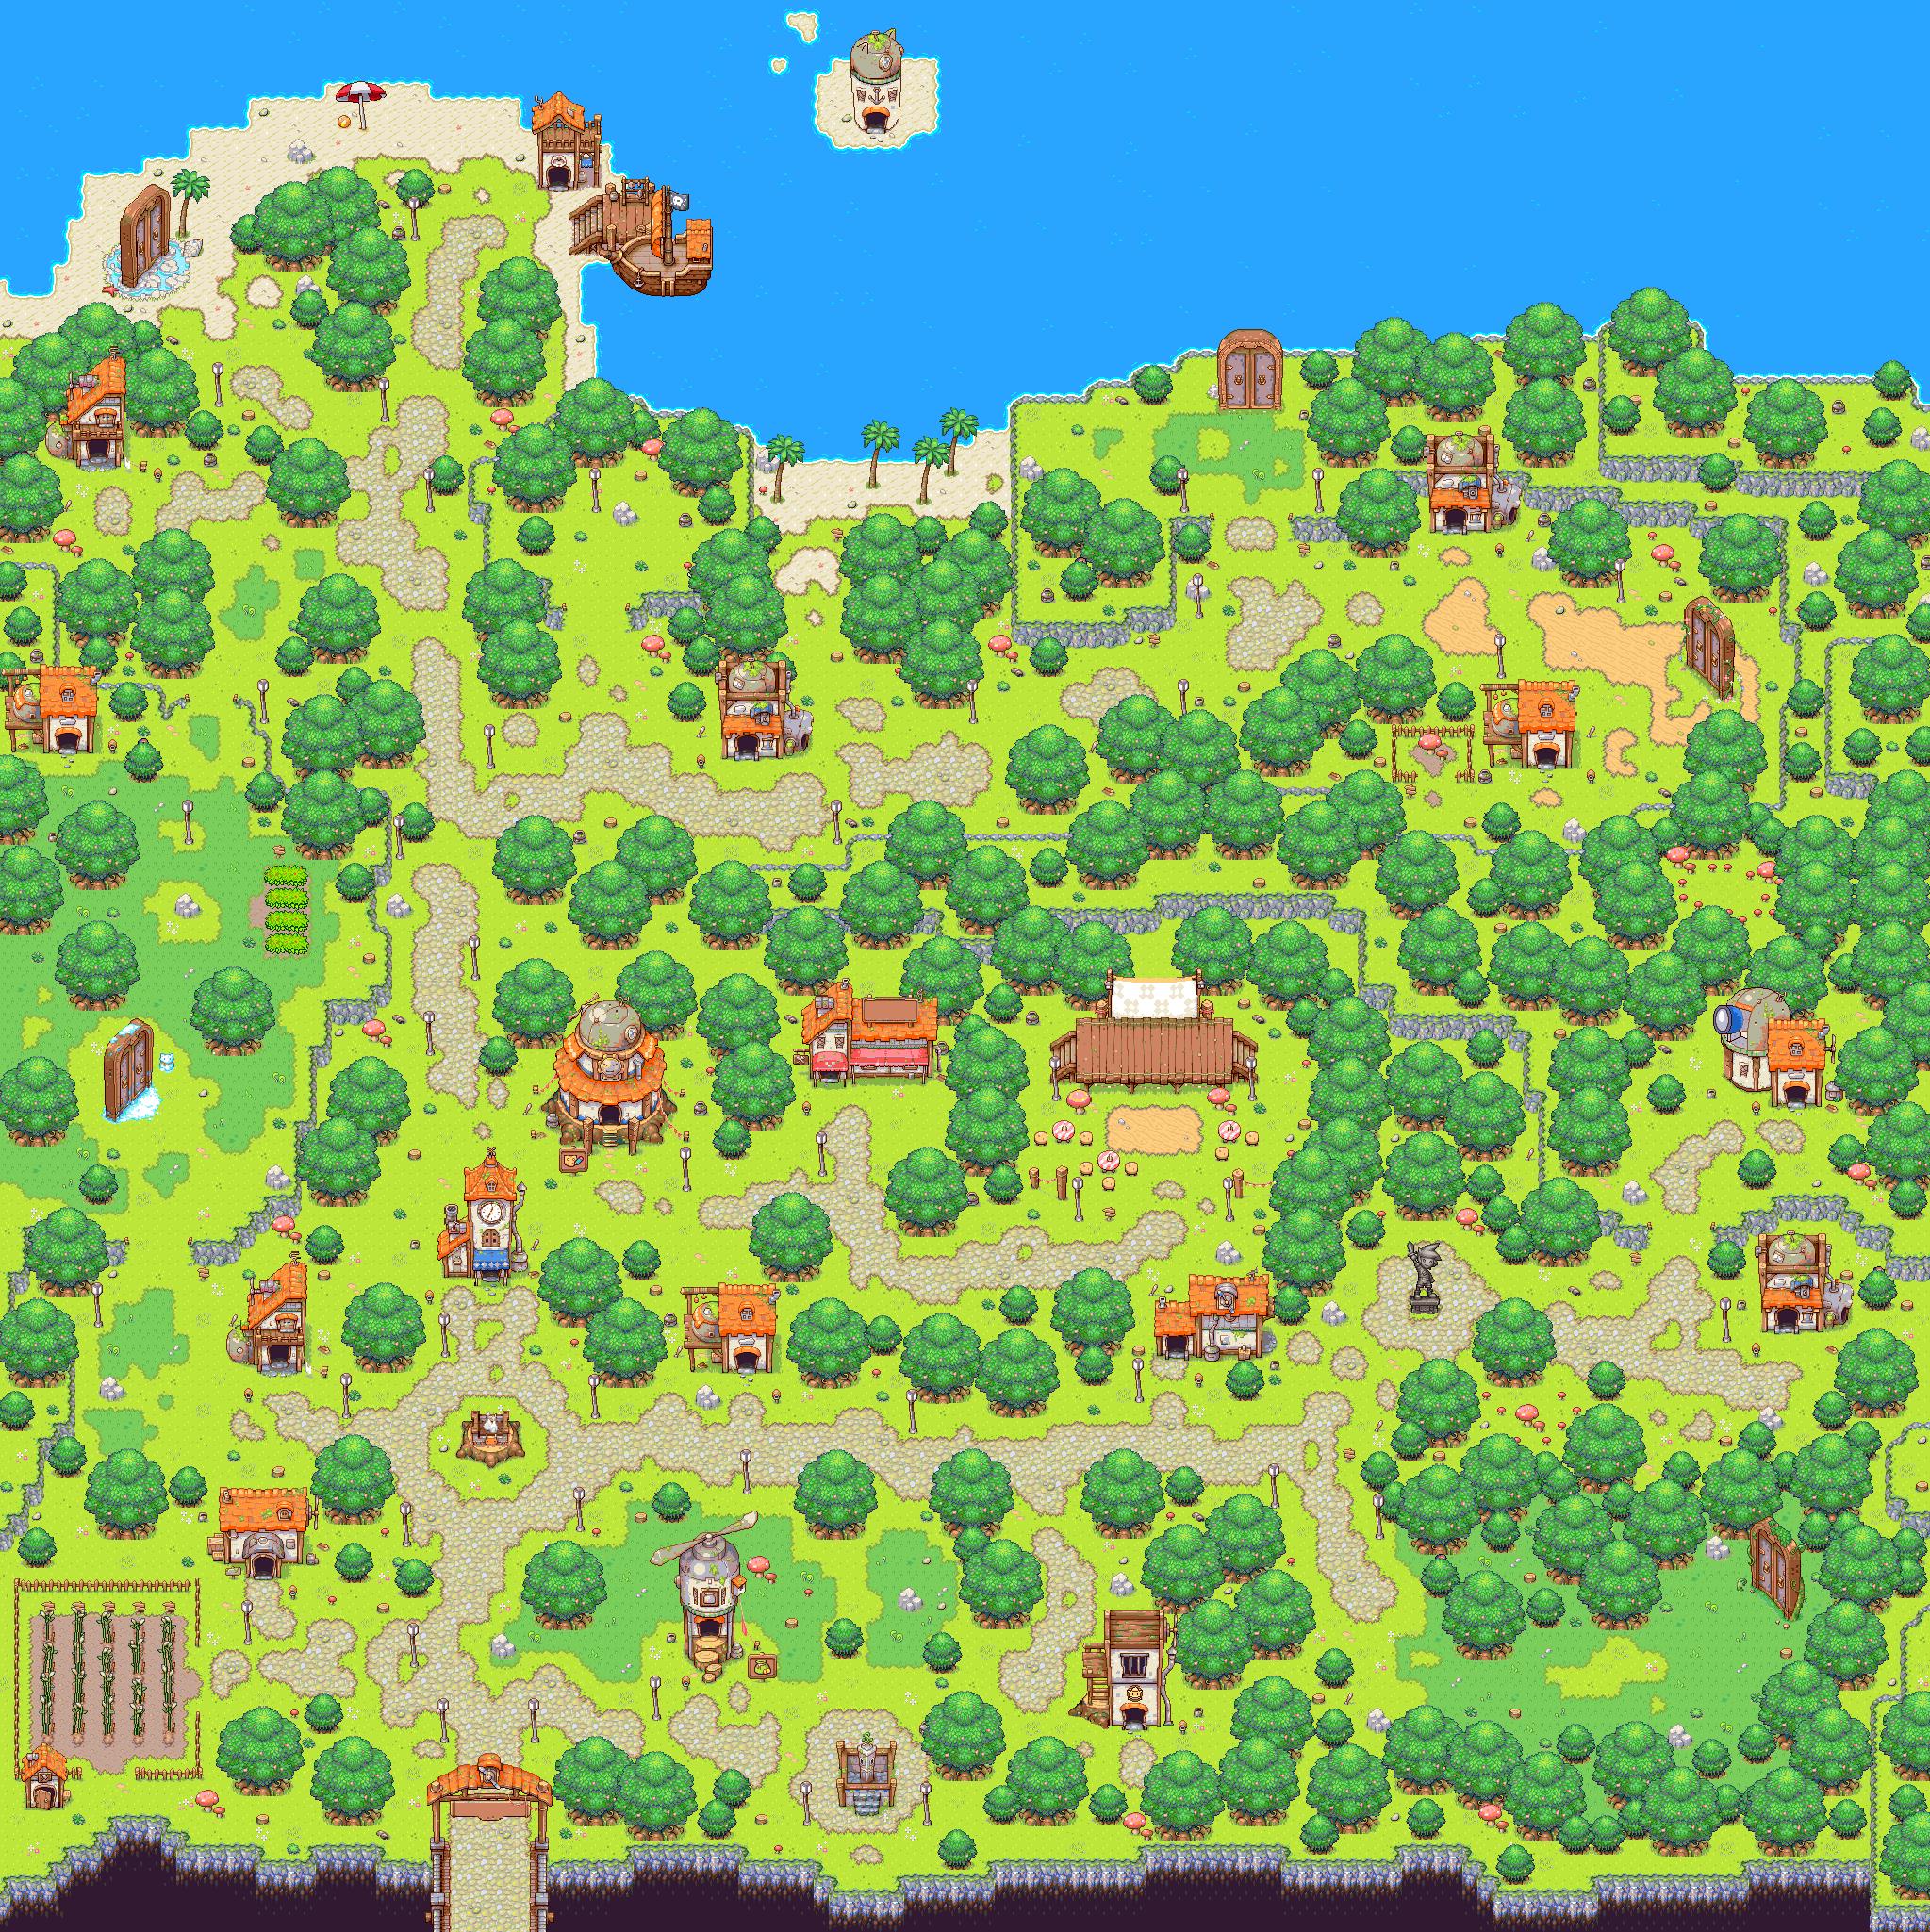 Village-Fullsize.png (Imagen PNG, 2047 × 2049 píxeles)